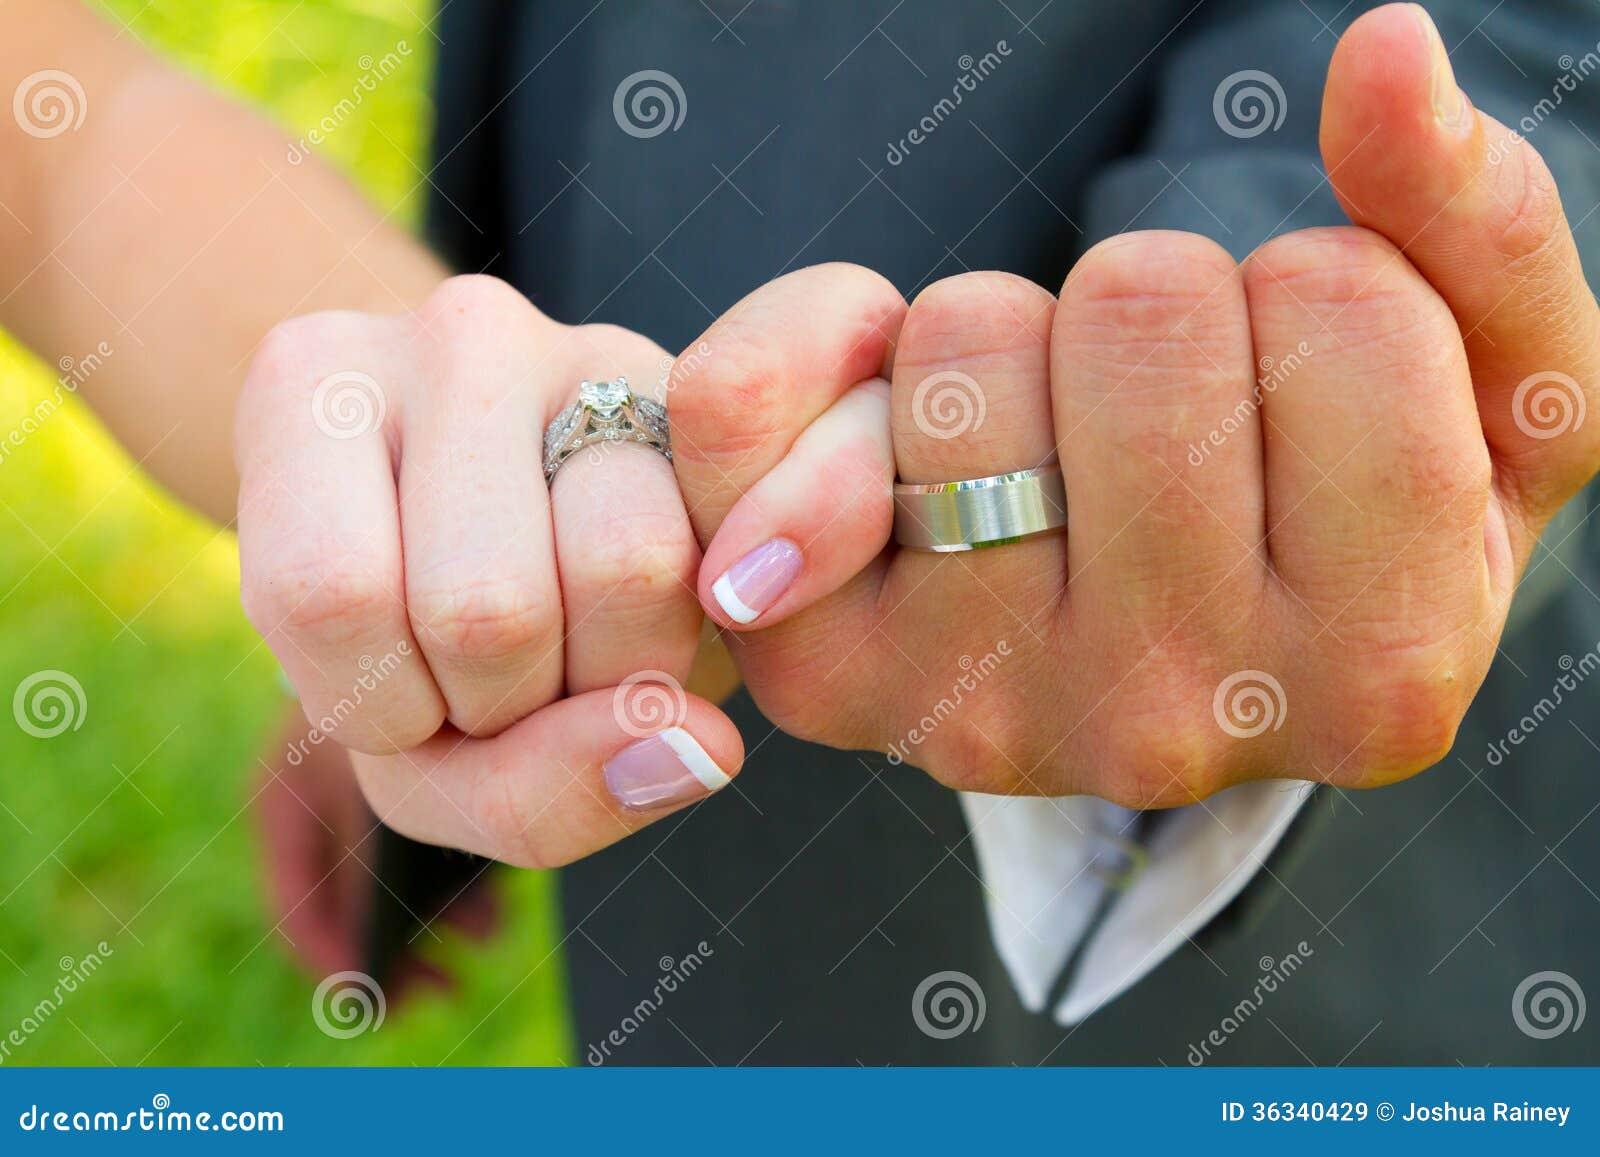 Pinky Swear Wedding Rings Stock Image Image Of Female